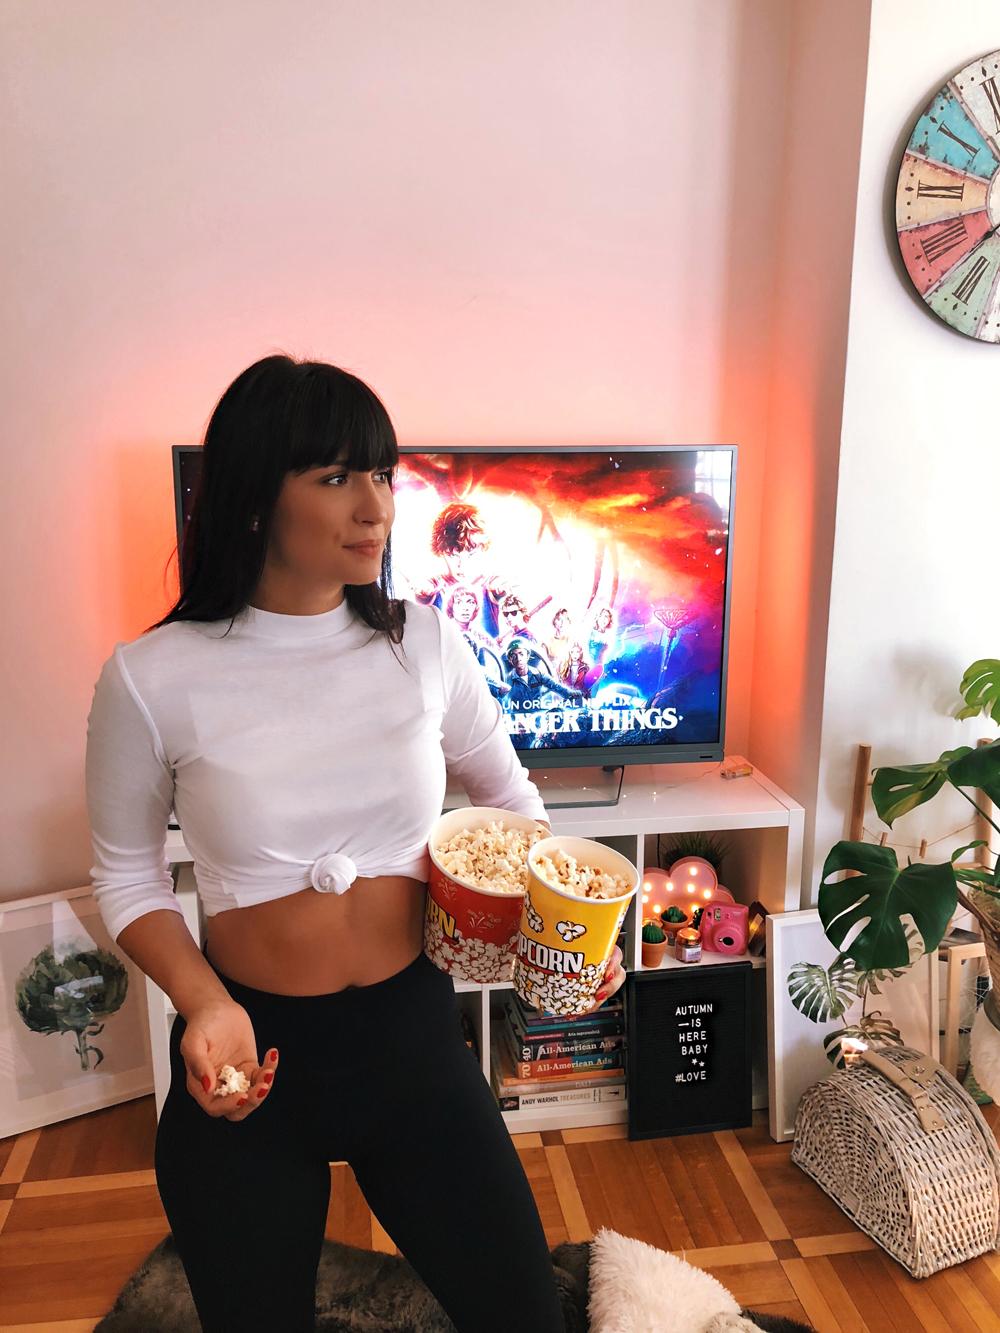 sandra stoicovici philips tv netflix seriale